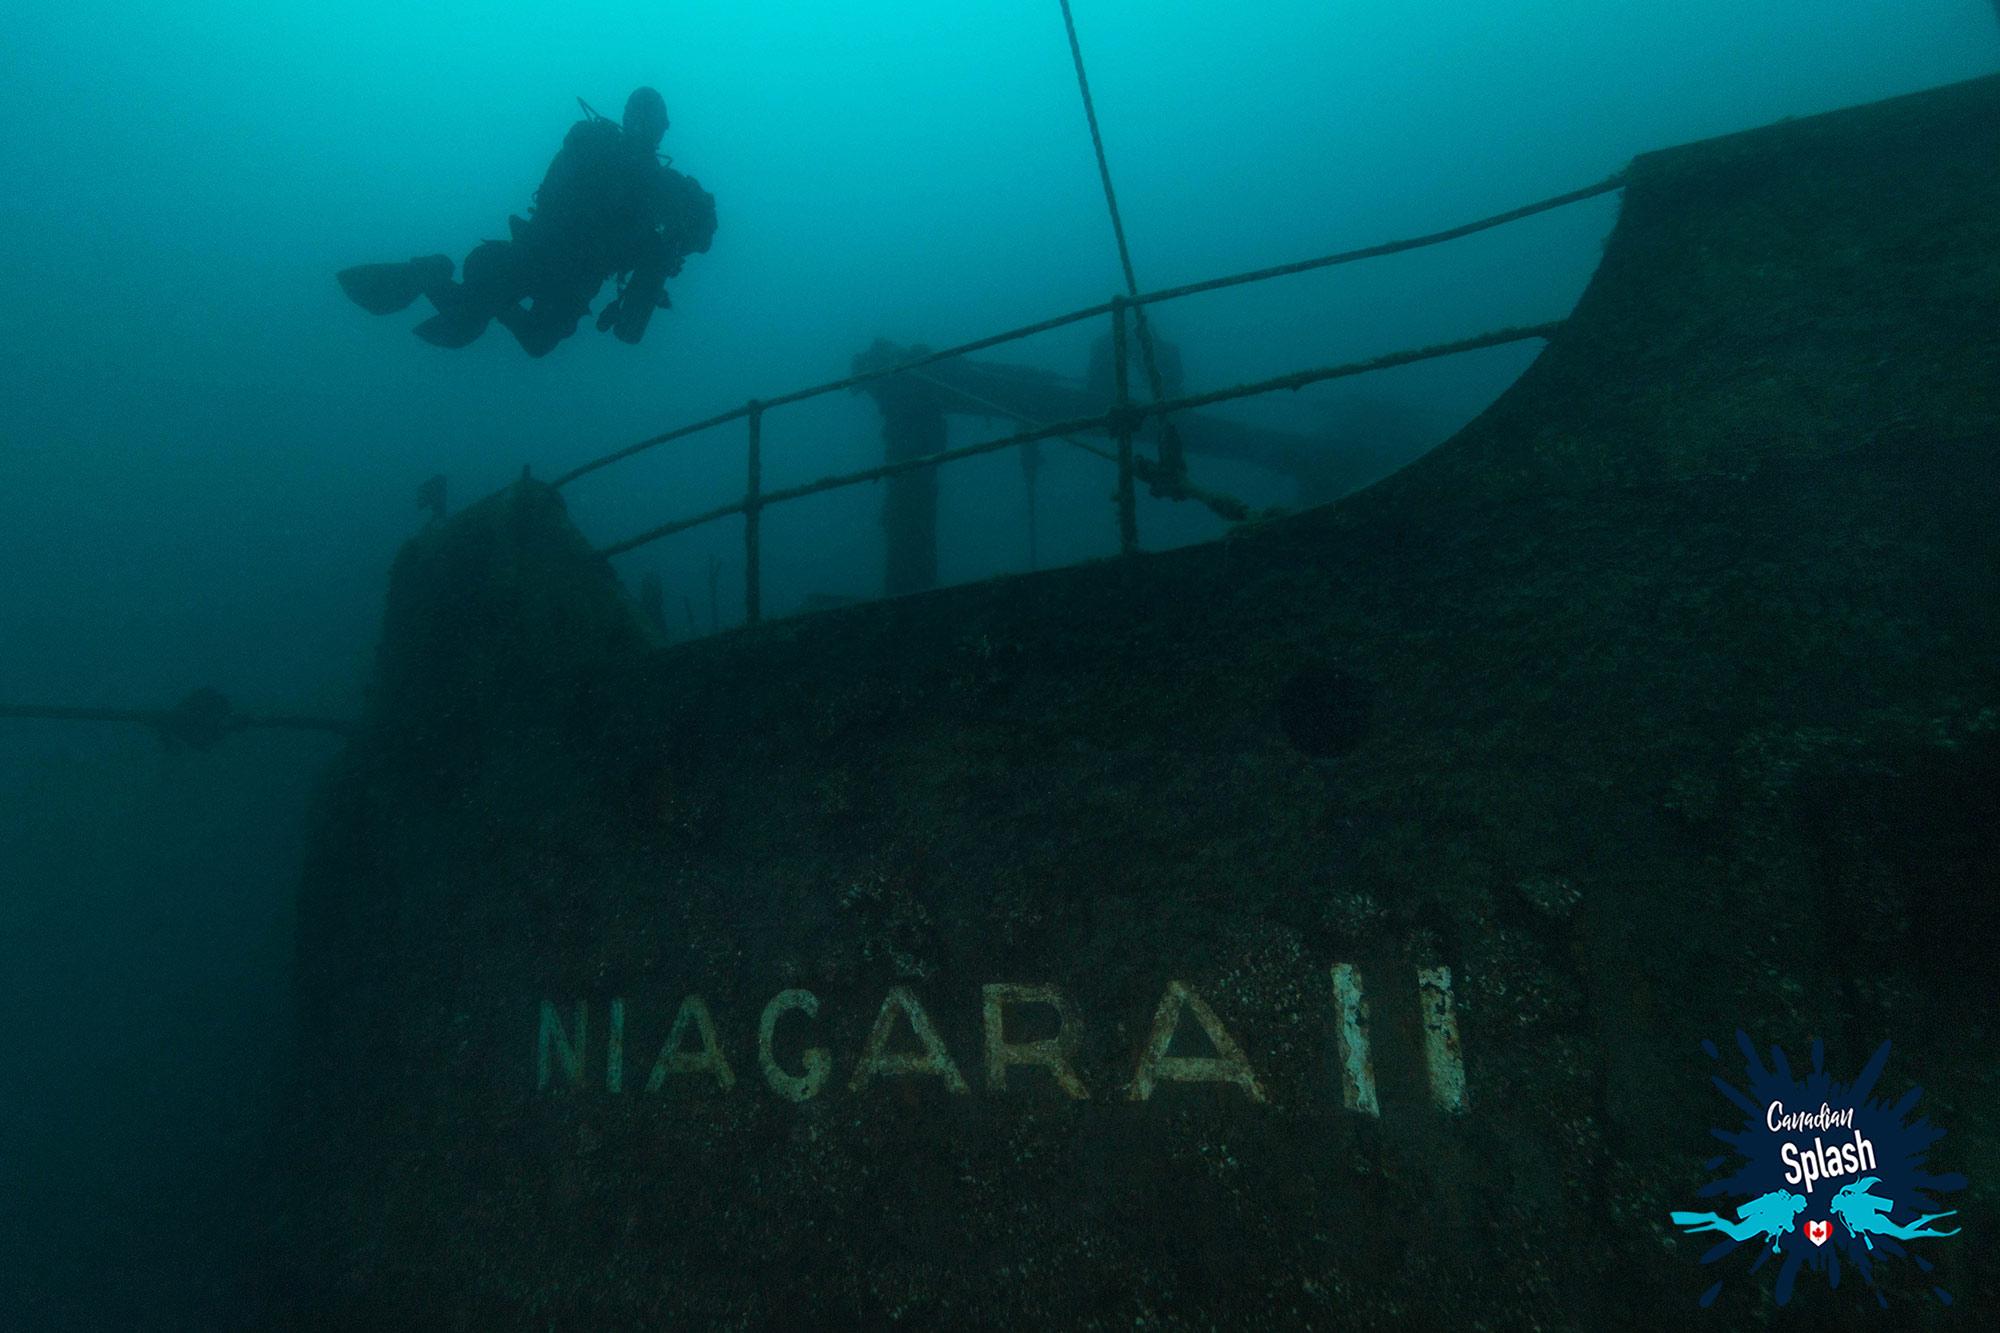 Scuba Divers Silhouette Diving Tobermory's Niagara II, Ontario, Canada Diving